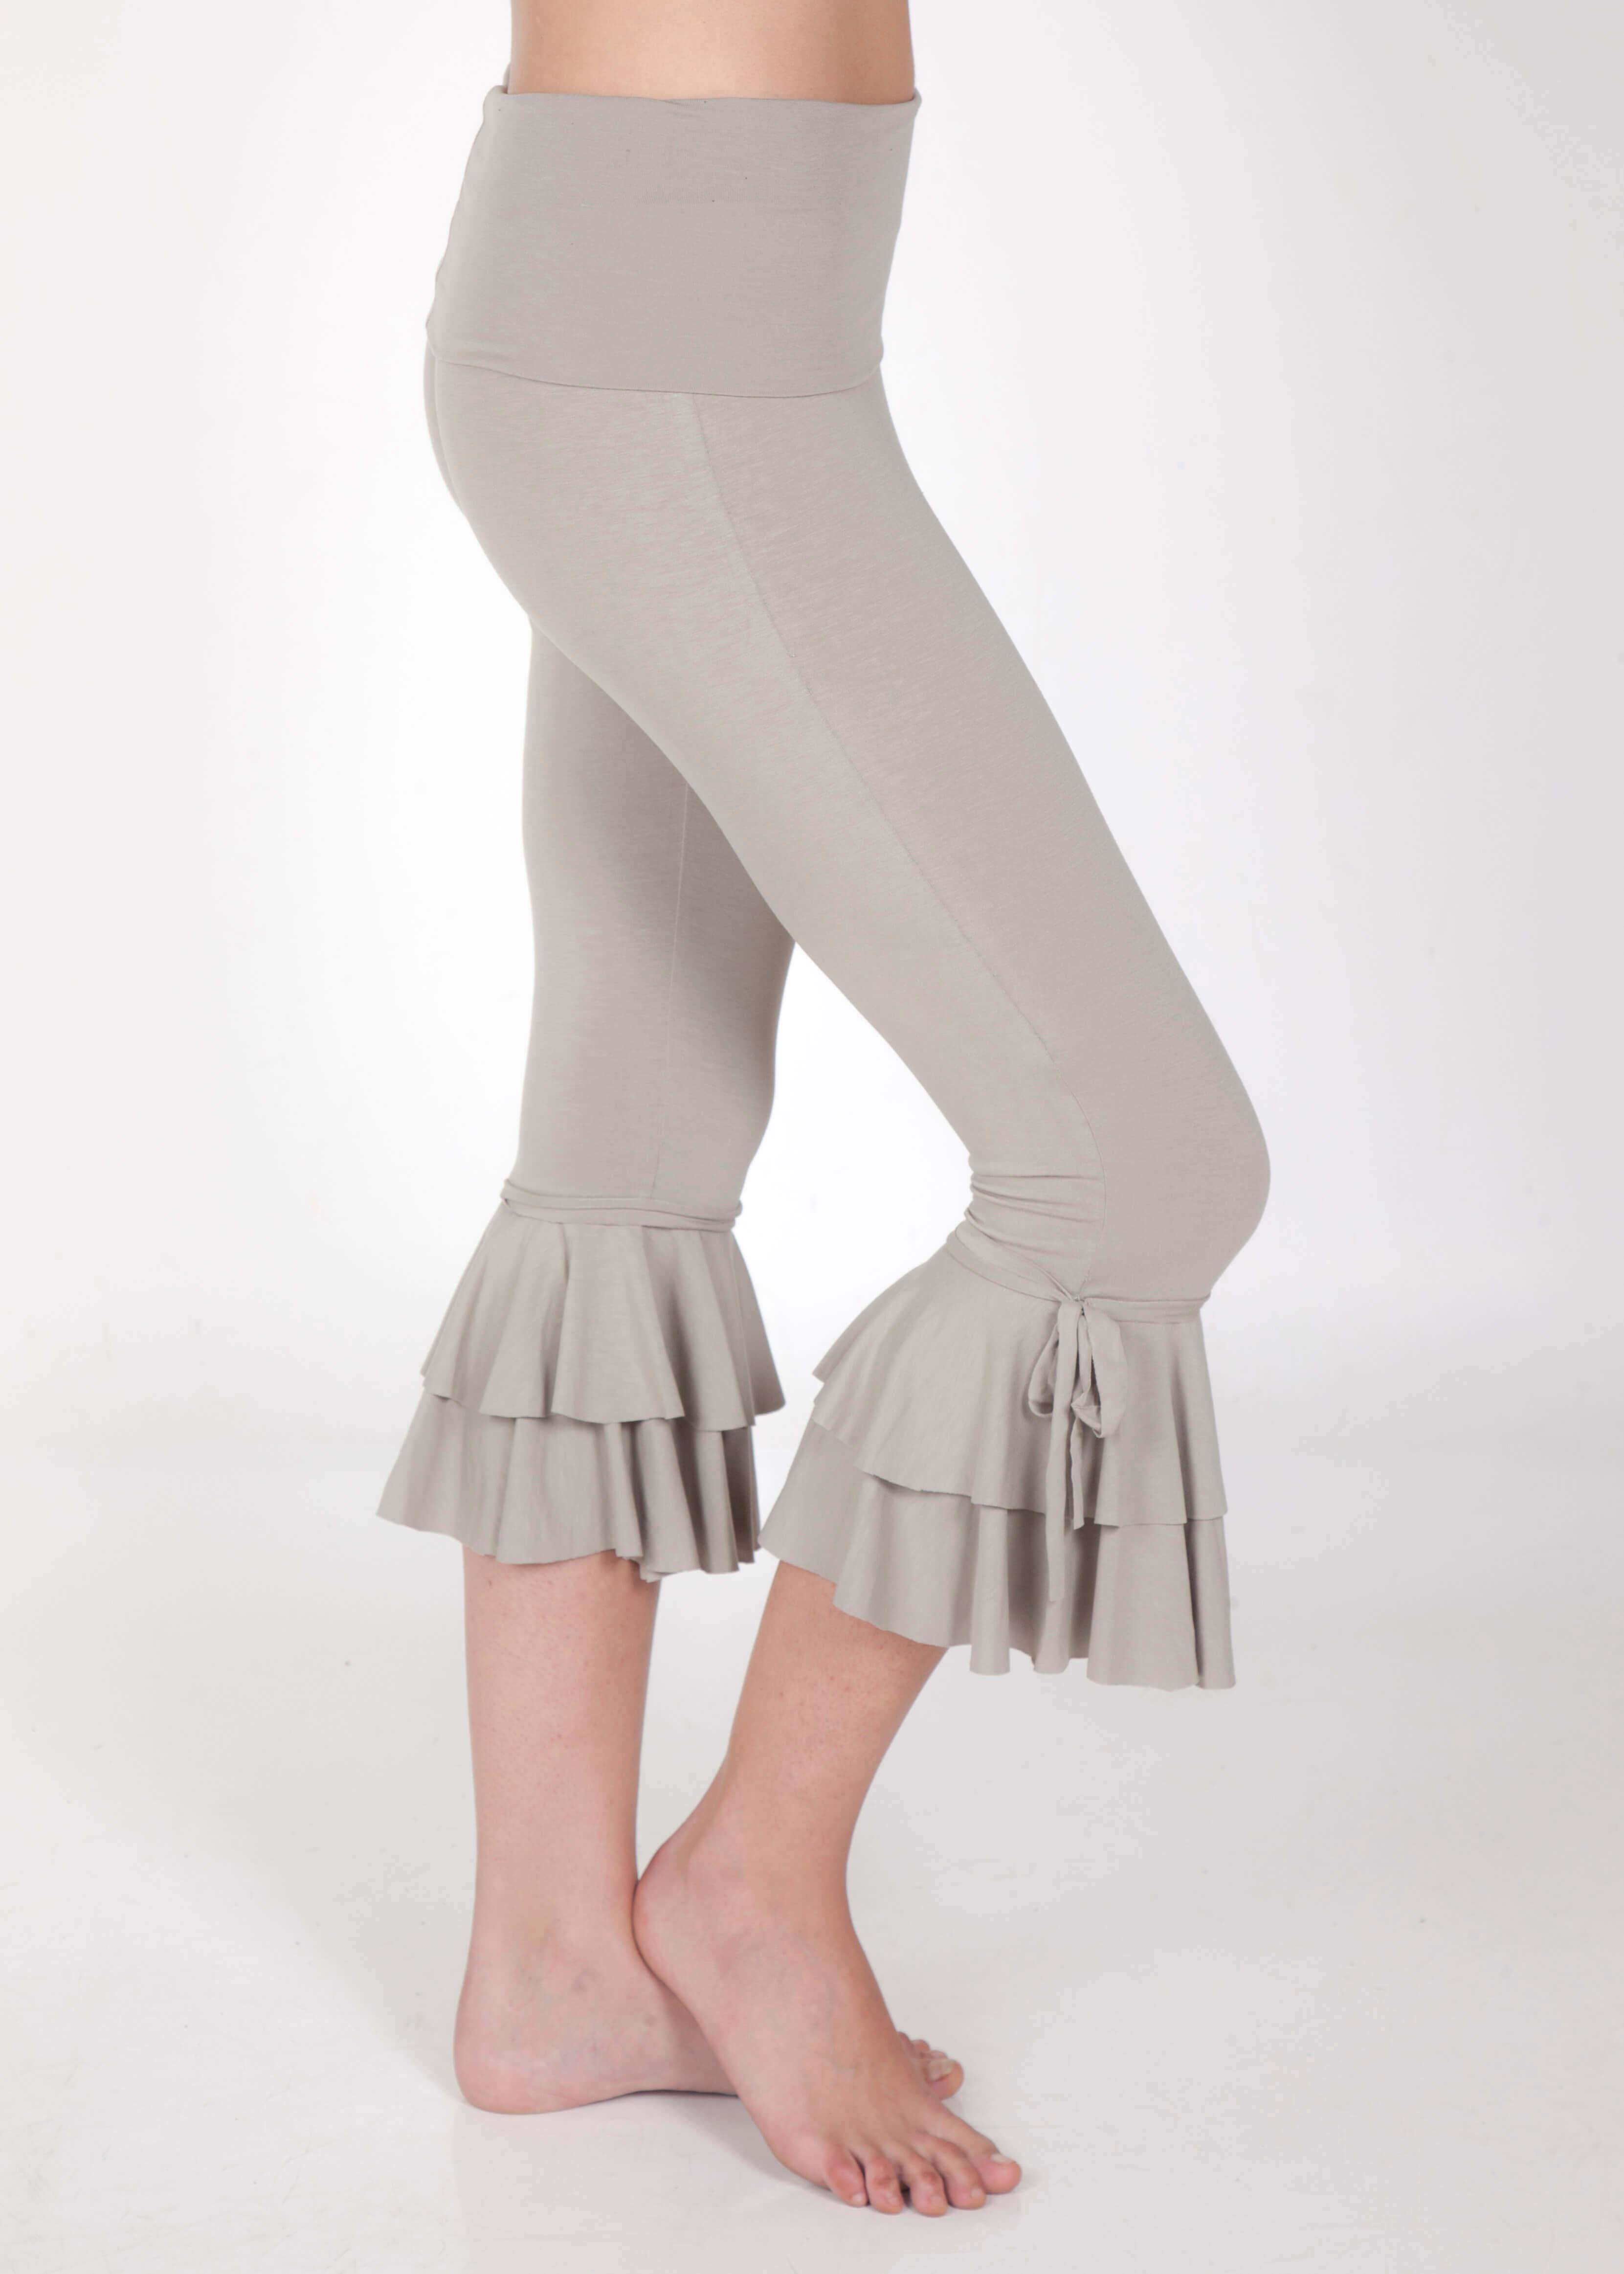 Yoga clothes for Women affordable yoga clothes for women PHUJTGX